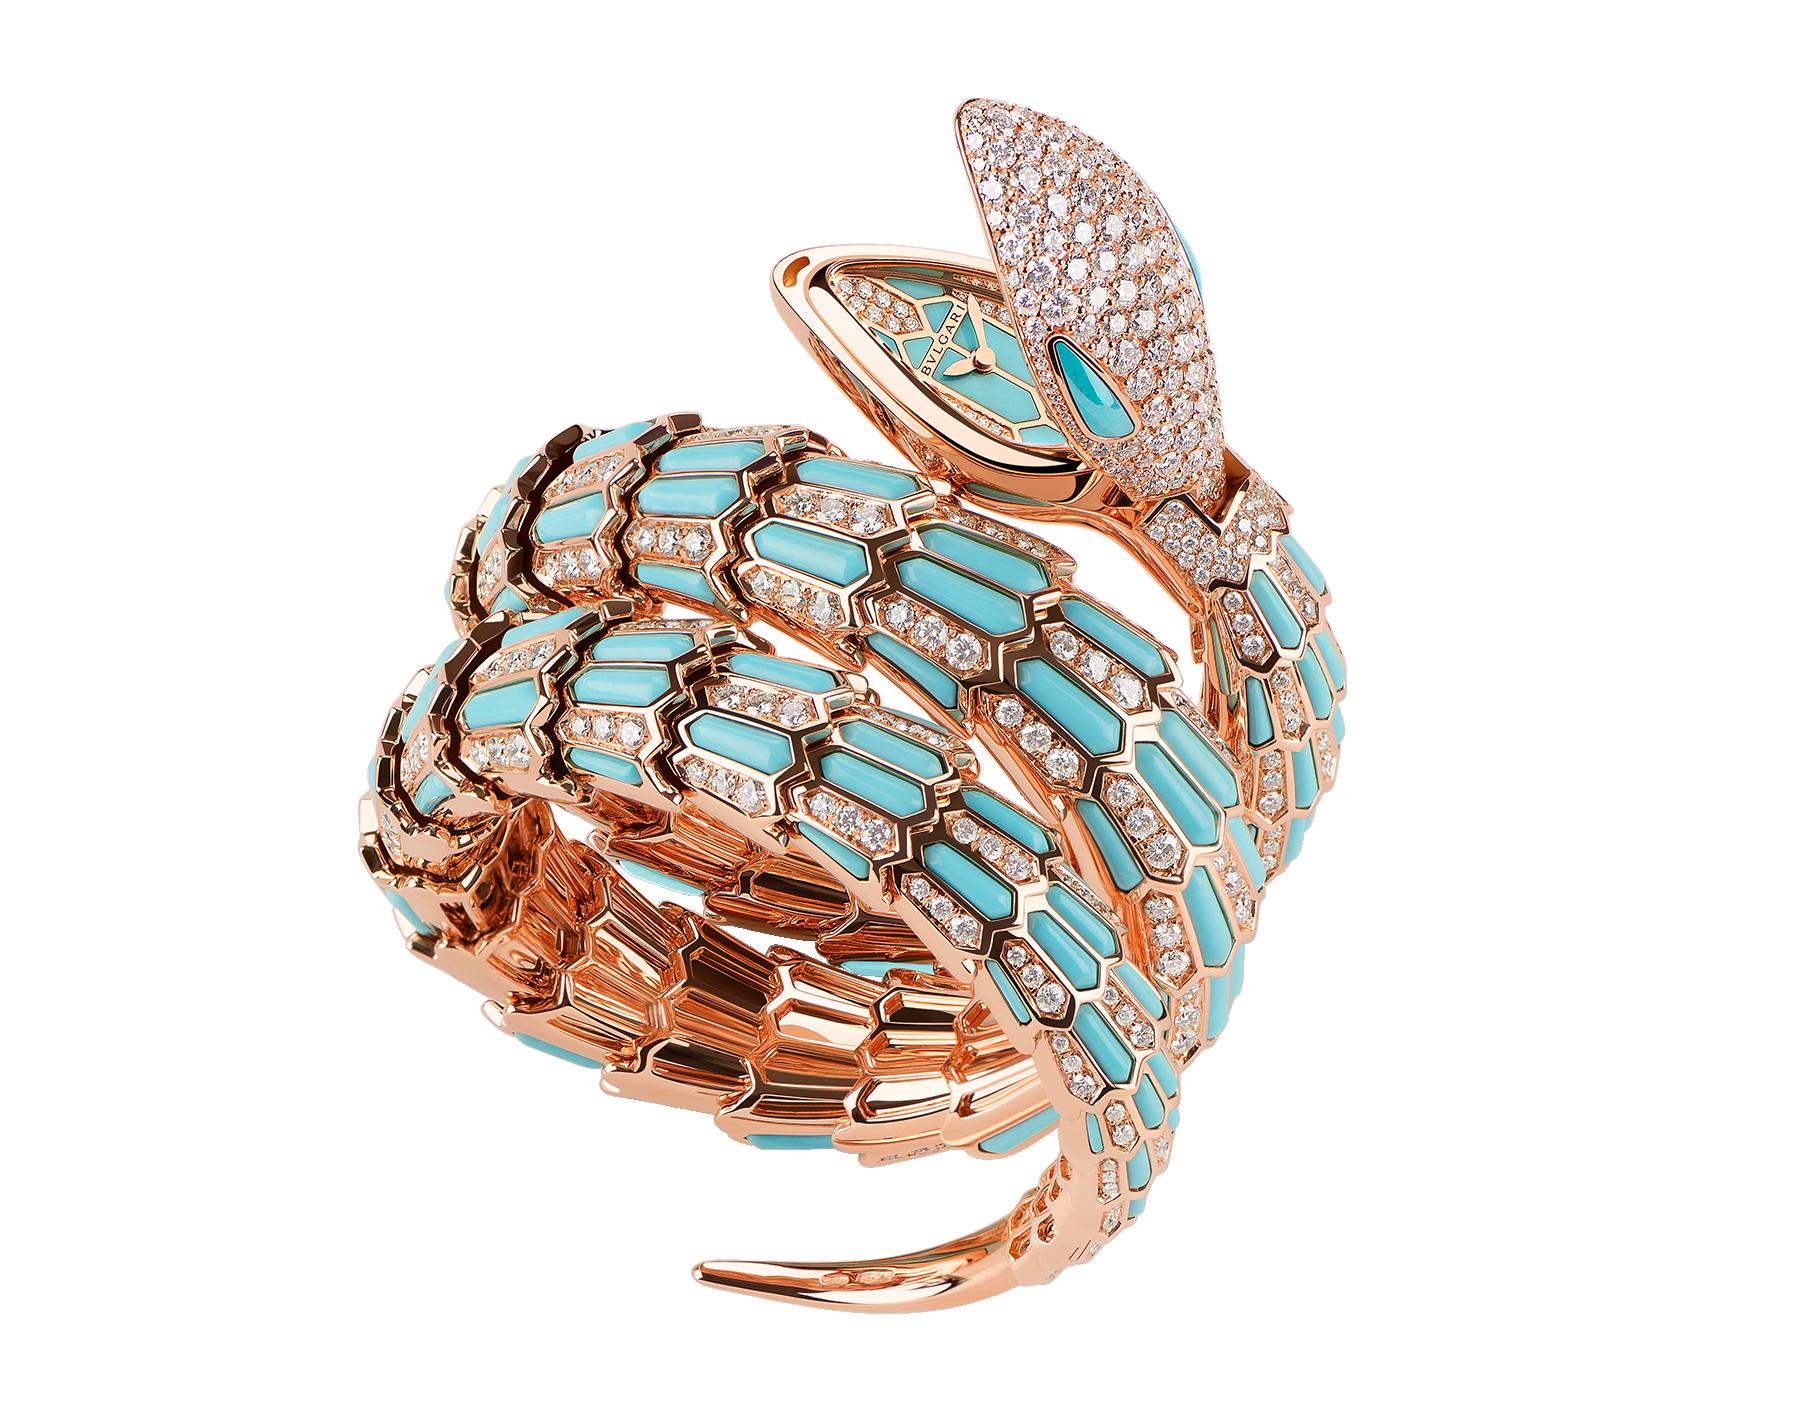 Serpenti Secret Watch 腕錶,18K 玫瑰金蛇頭鑲飾明亮型切割鑽石,蛇眼鑲飾綠松石,18K 玫瑰金錶殼,18K 玫瑰金錶盤和雙圈螺旋錶帶鑲飾明亮型切割鑽石和綠松石。 102142 image 1